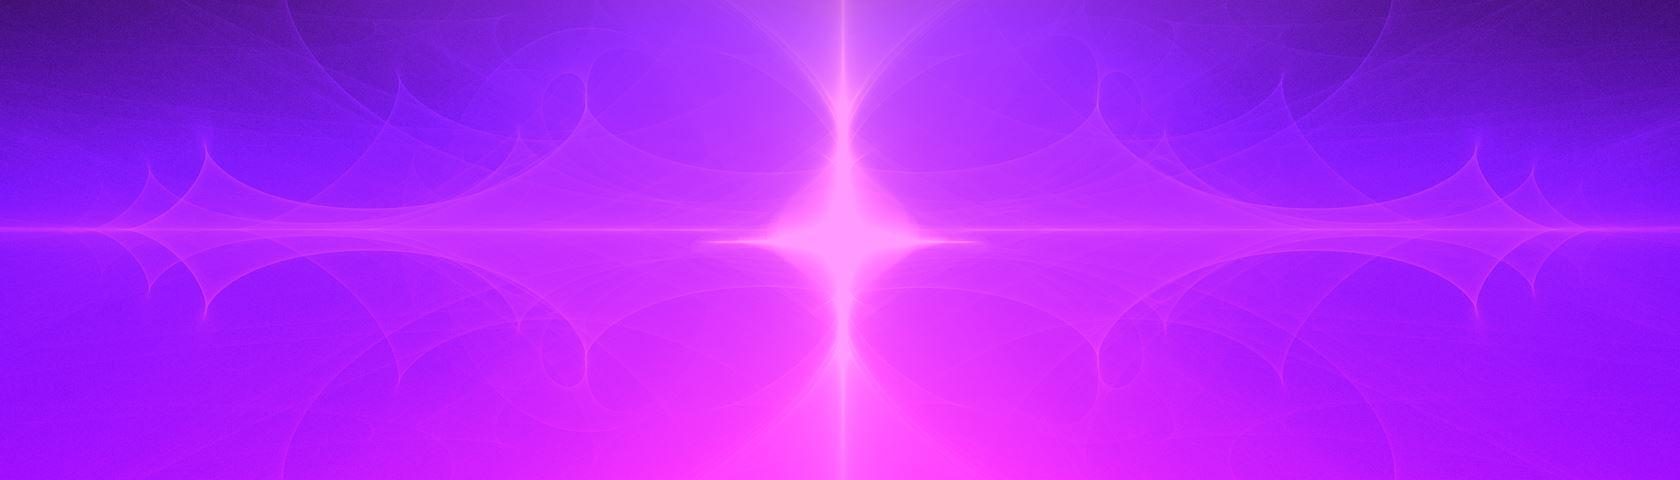 Violet Vibrance